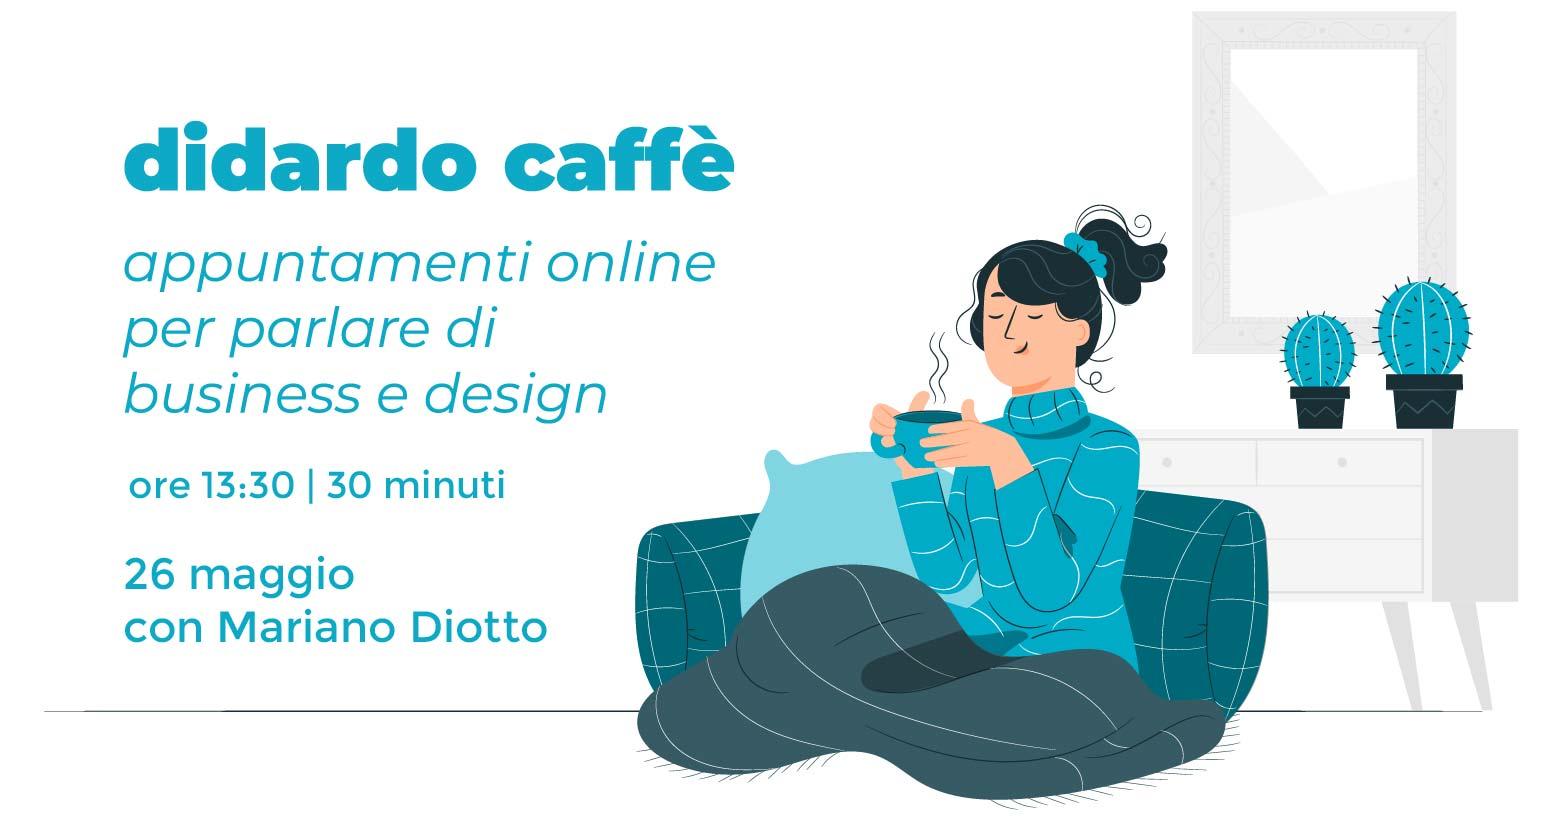 didardo-caffè-mariano-diotto